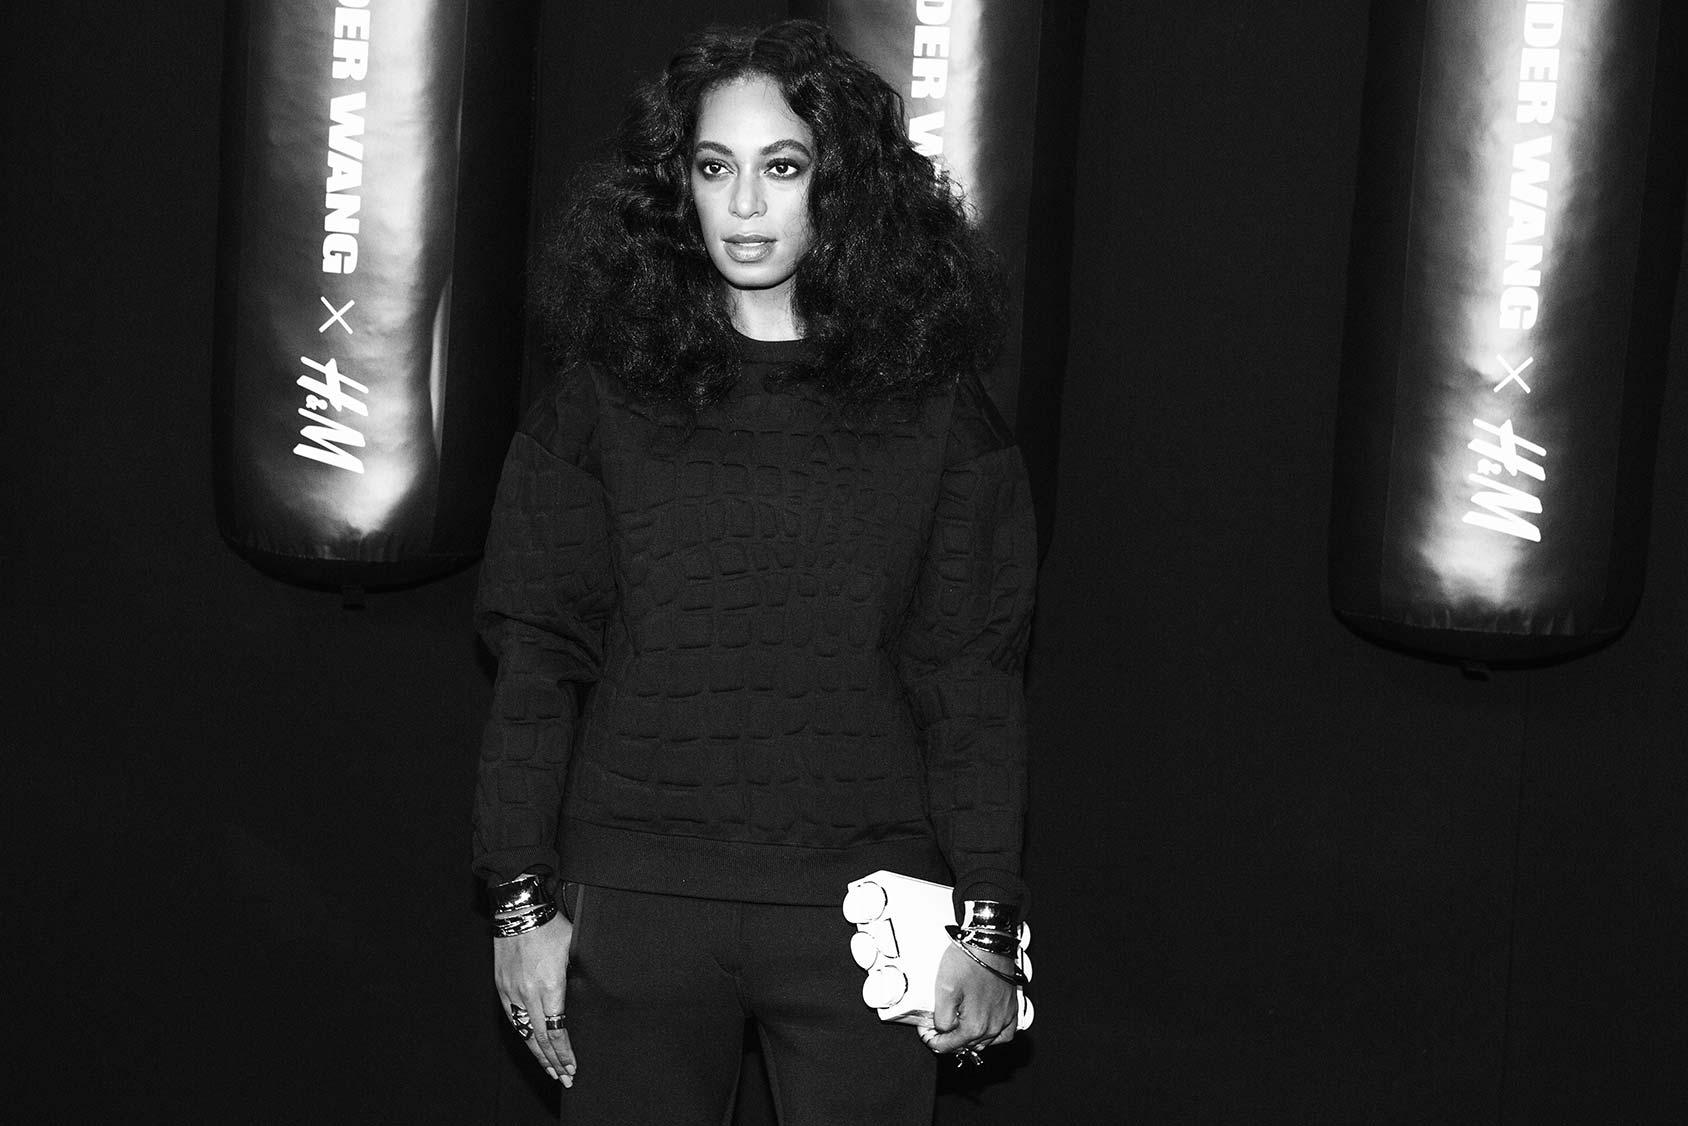 Solange Knowles On The Black Carpet